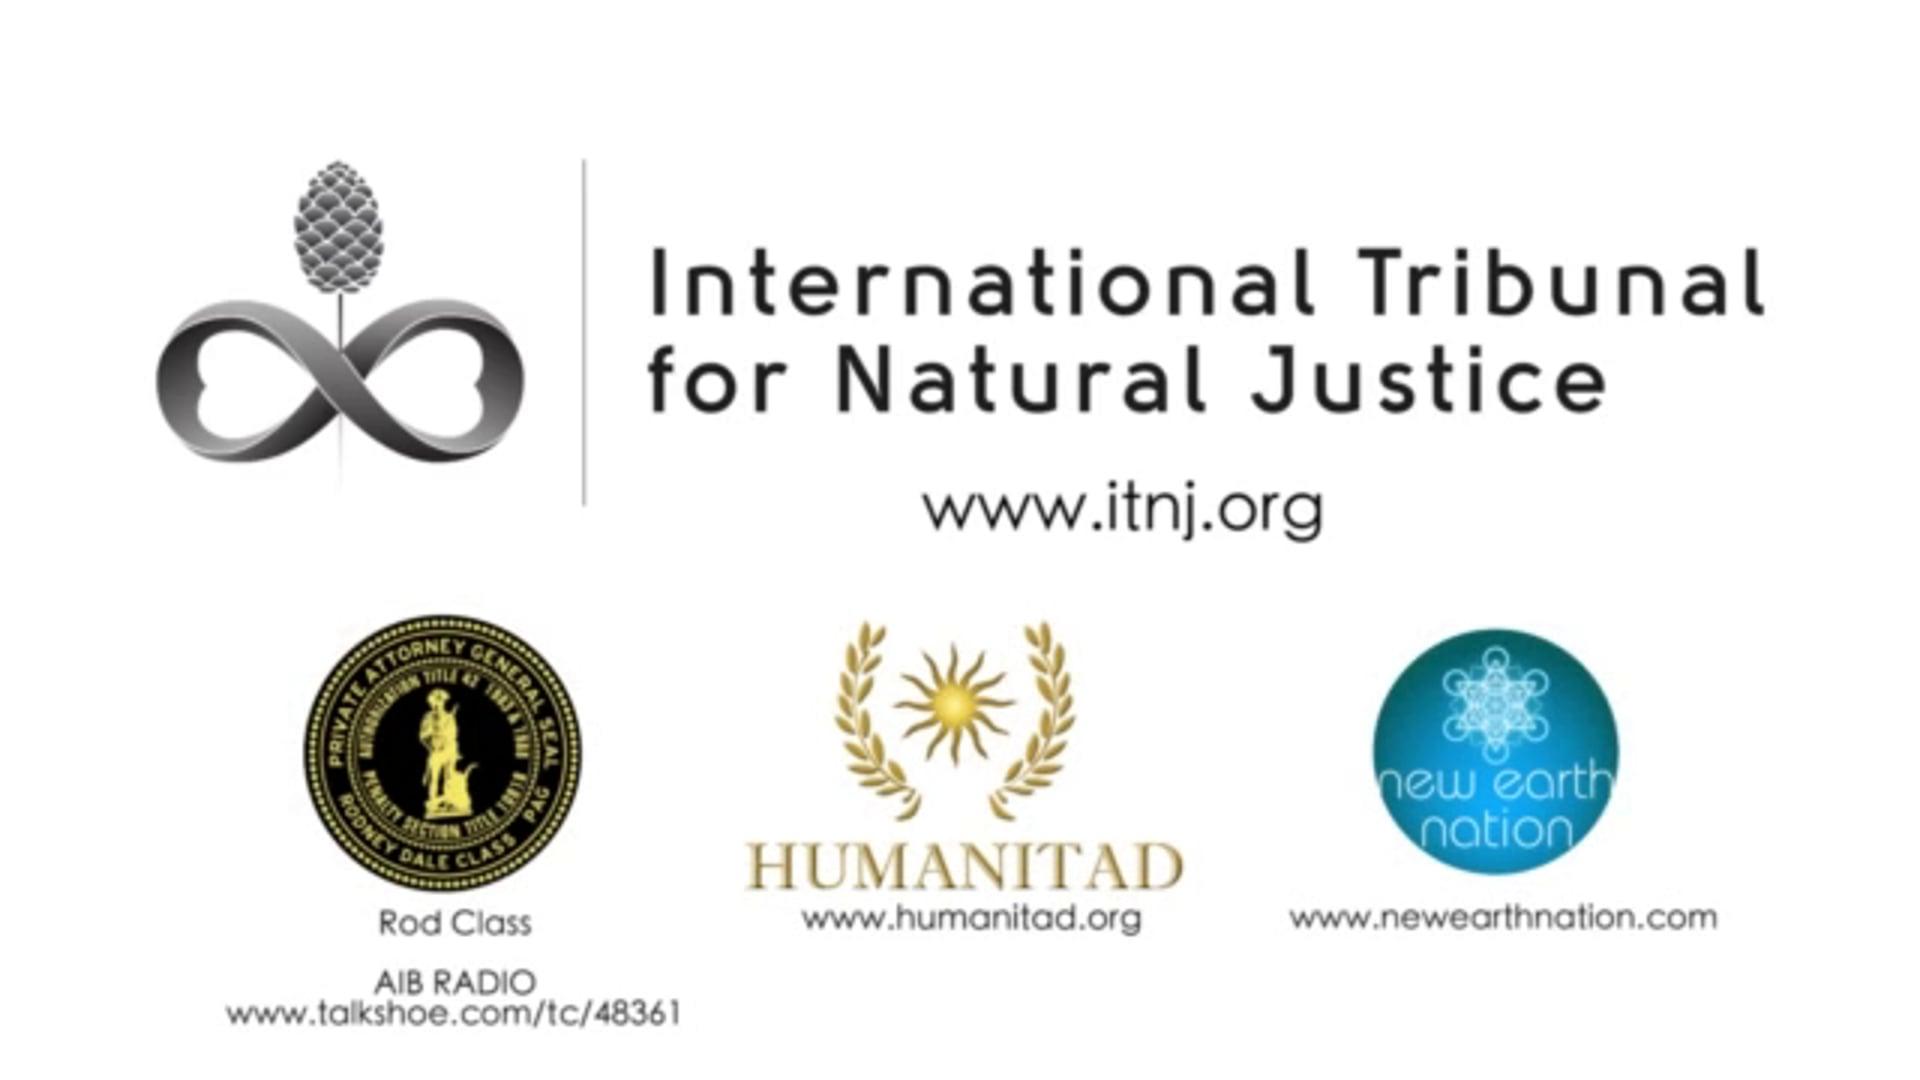 International Tribunal for Natural Justice